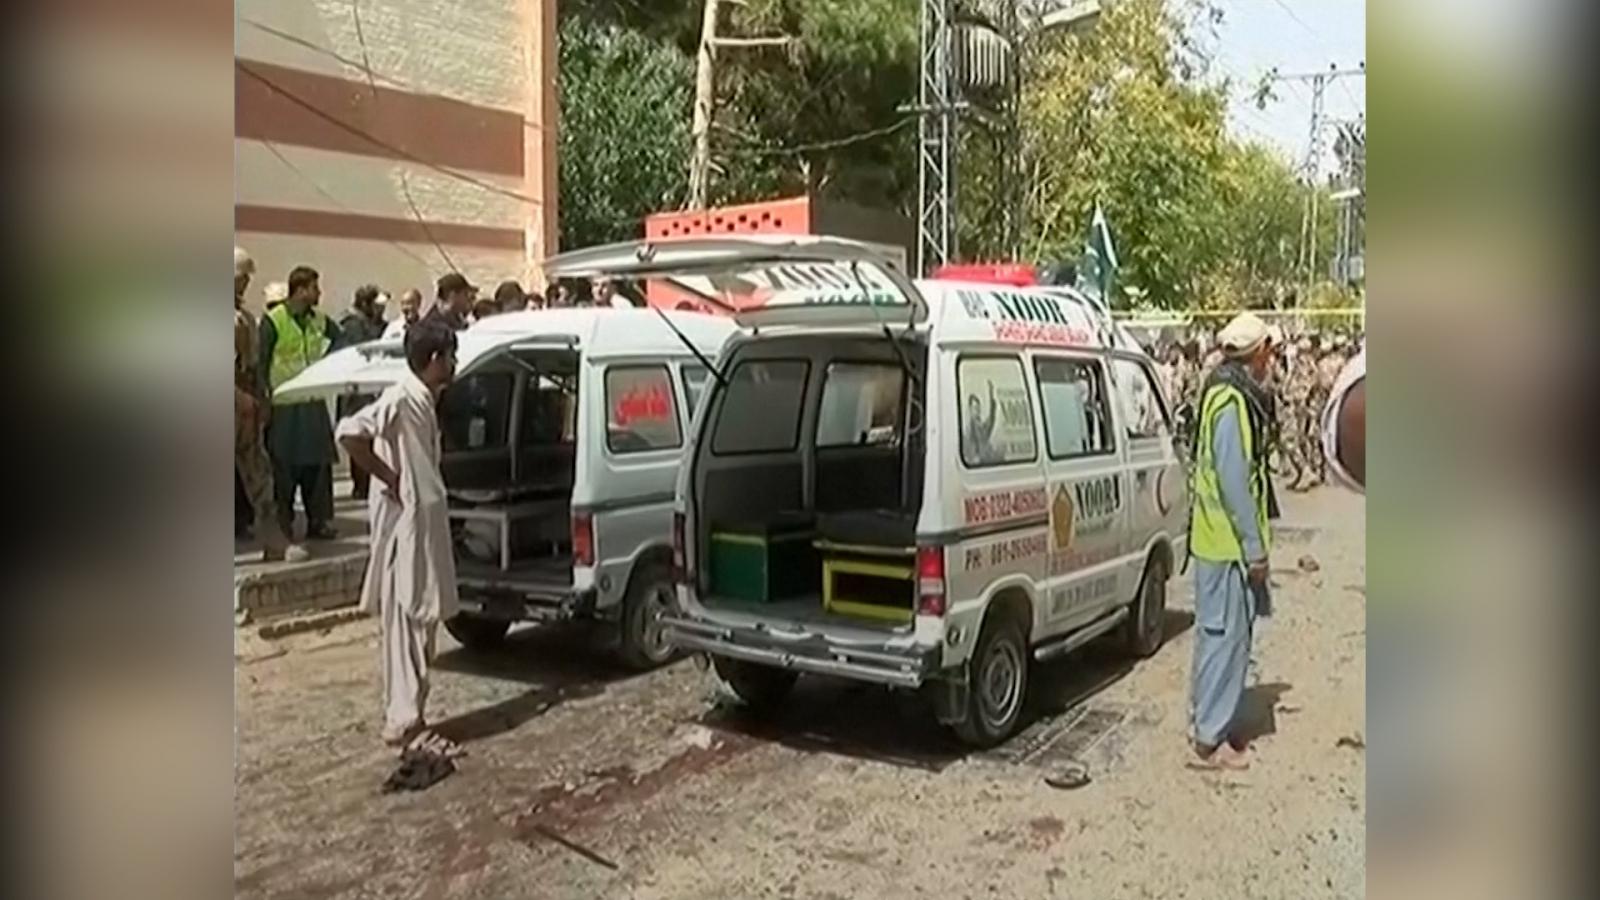 Pakistan hospital bomb attack